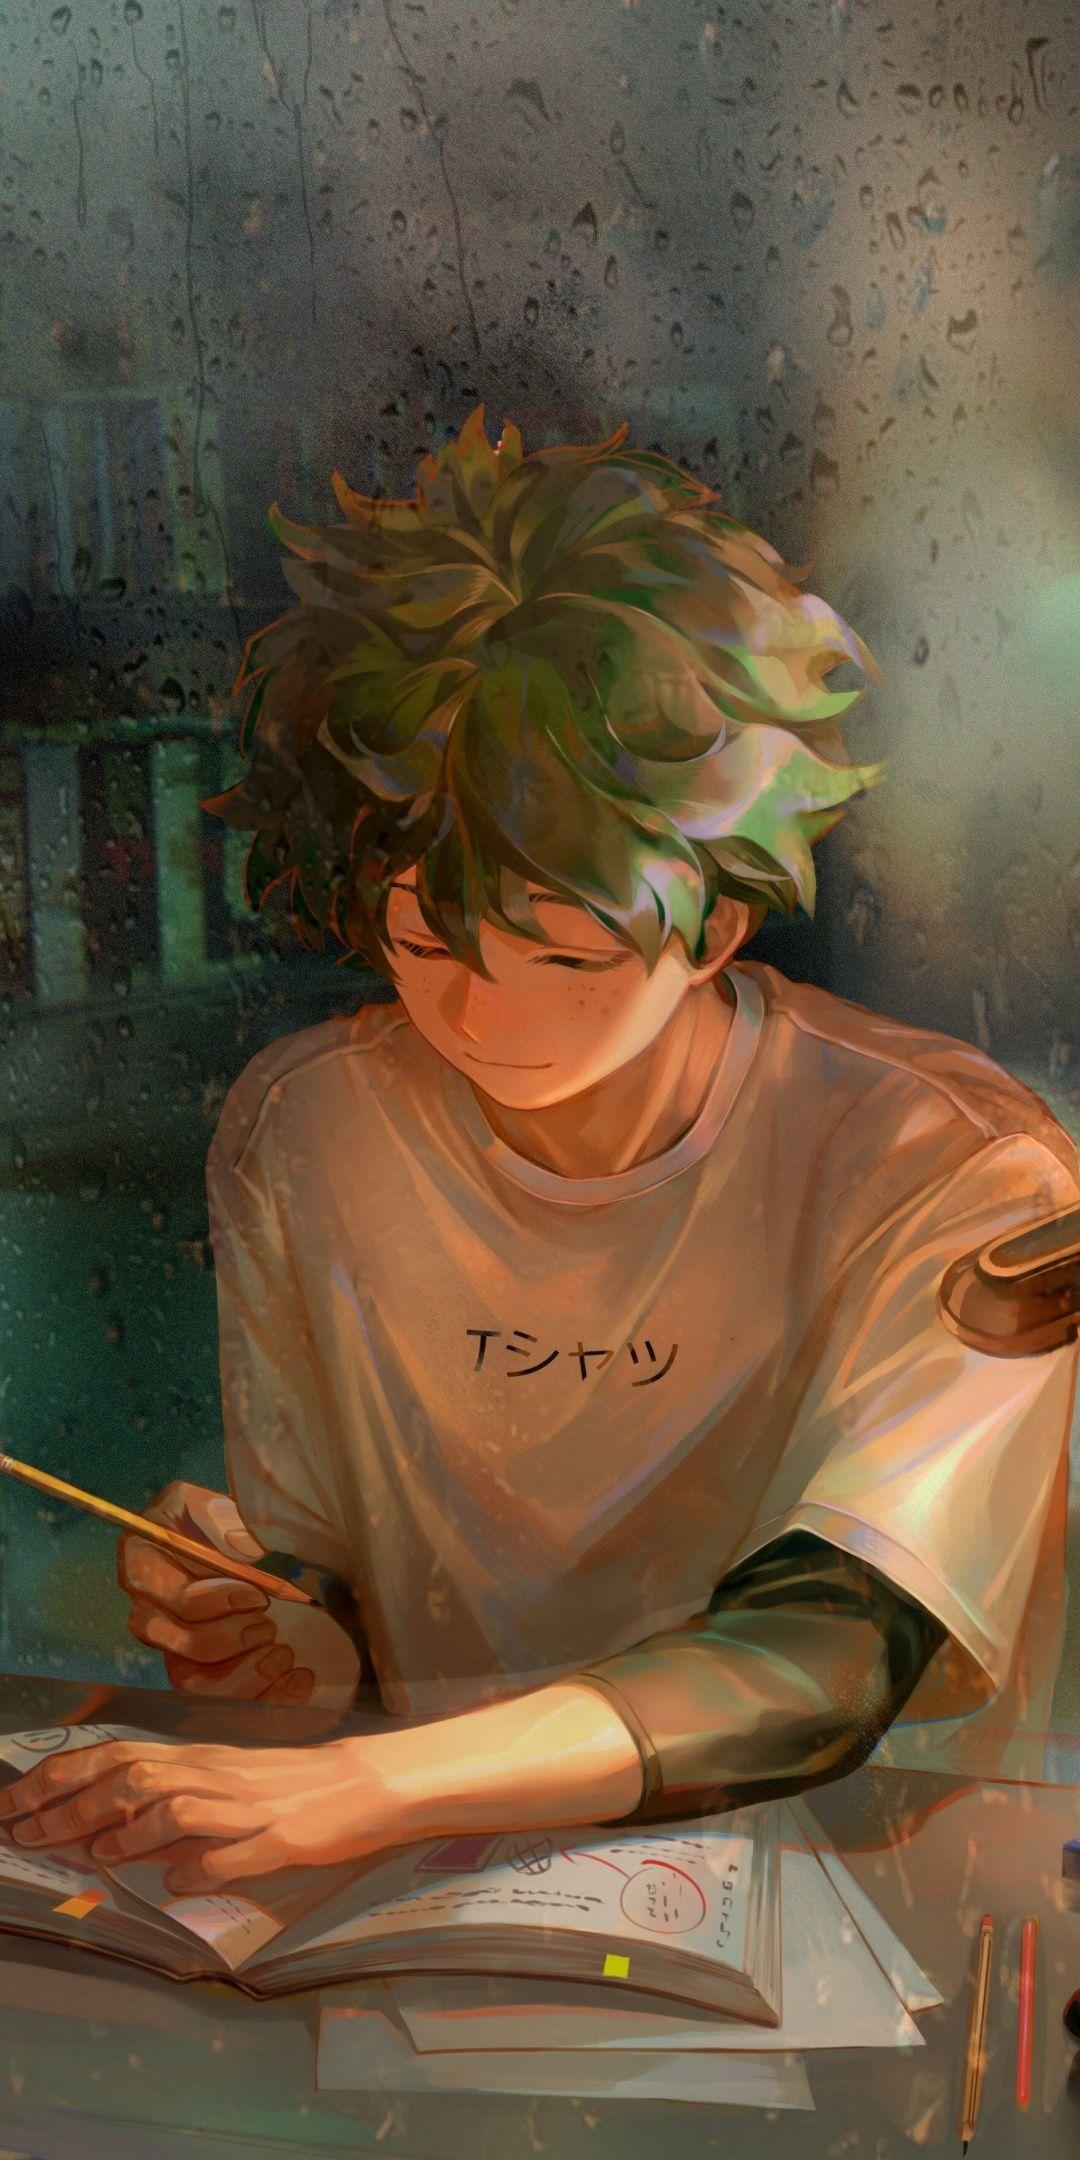 Aesthetic Boy Green Hair Monica Gallery In 2020 Aesthetic Anime Anime Boy Boy Art